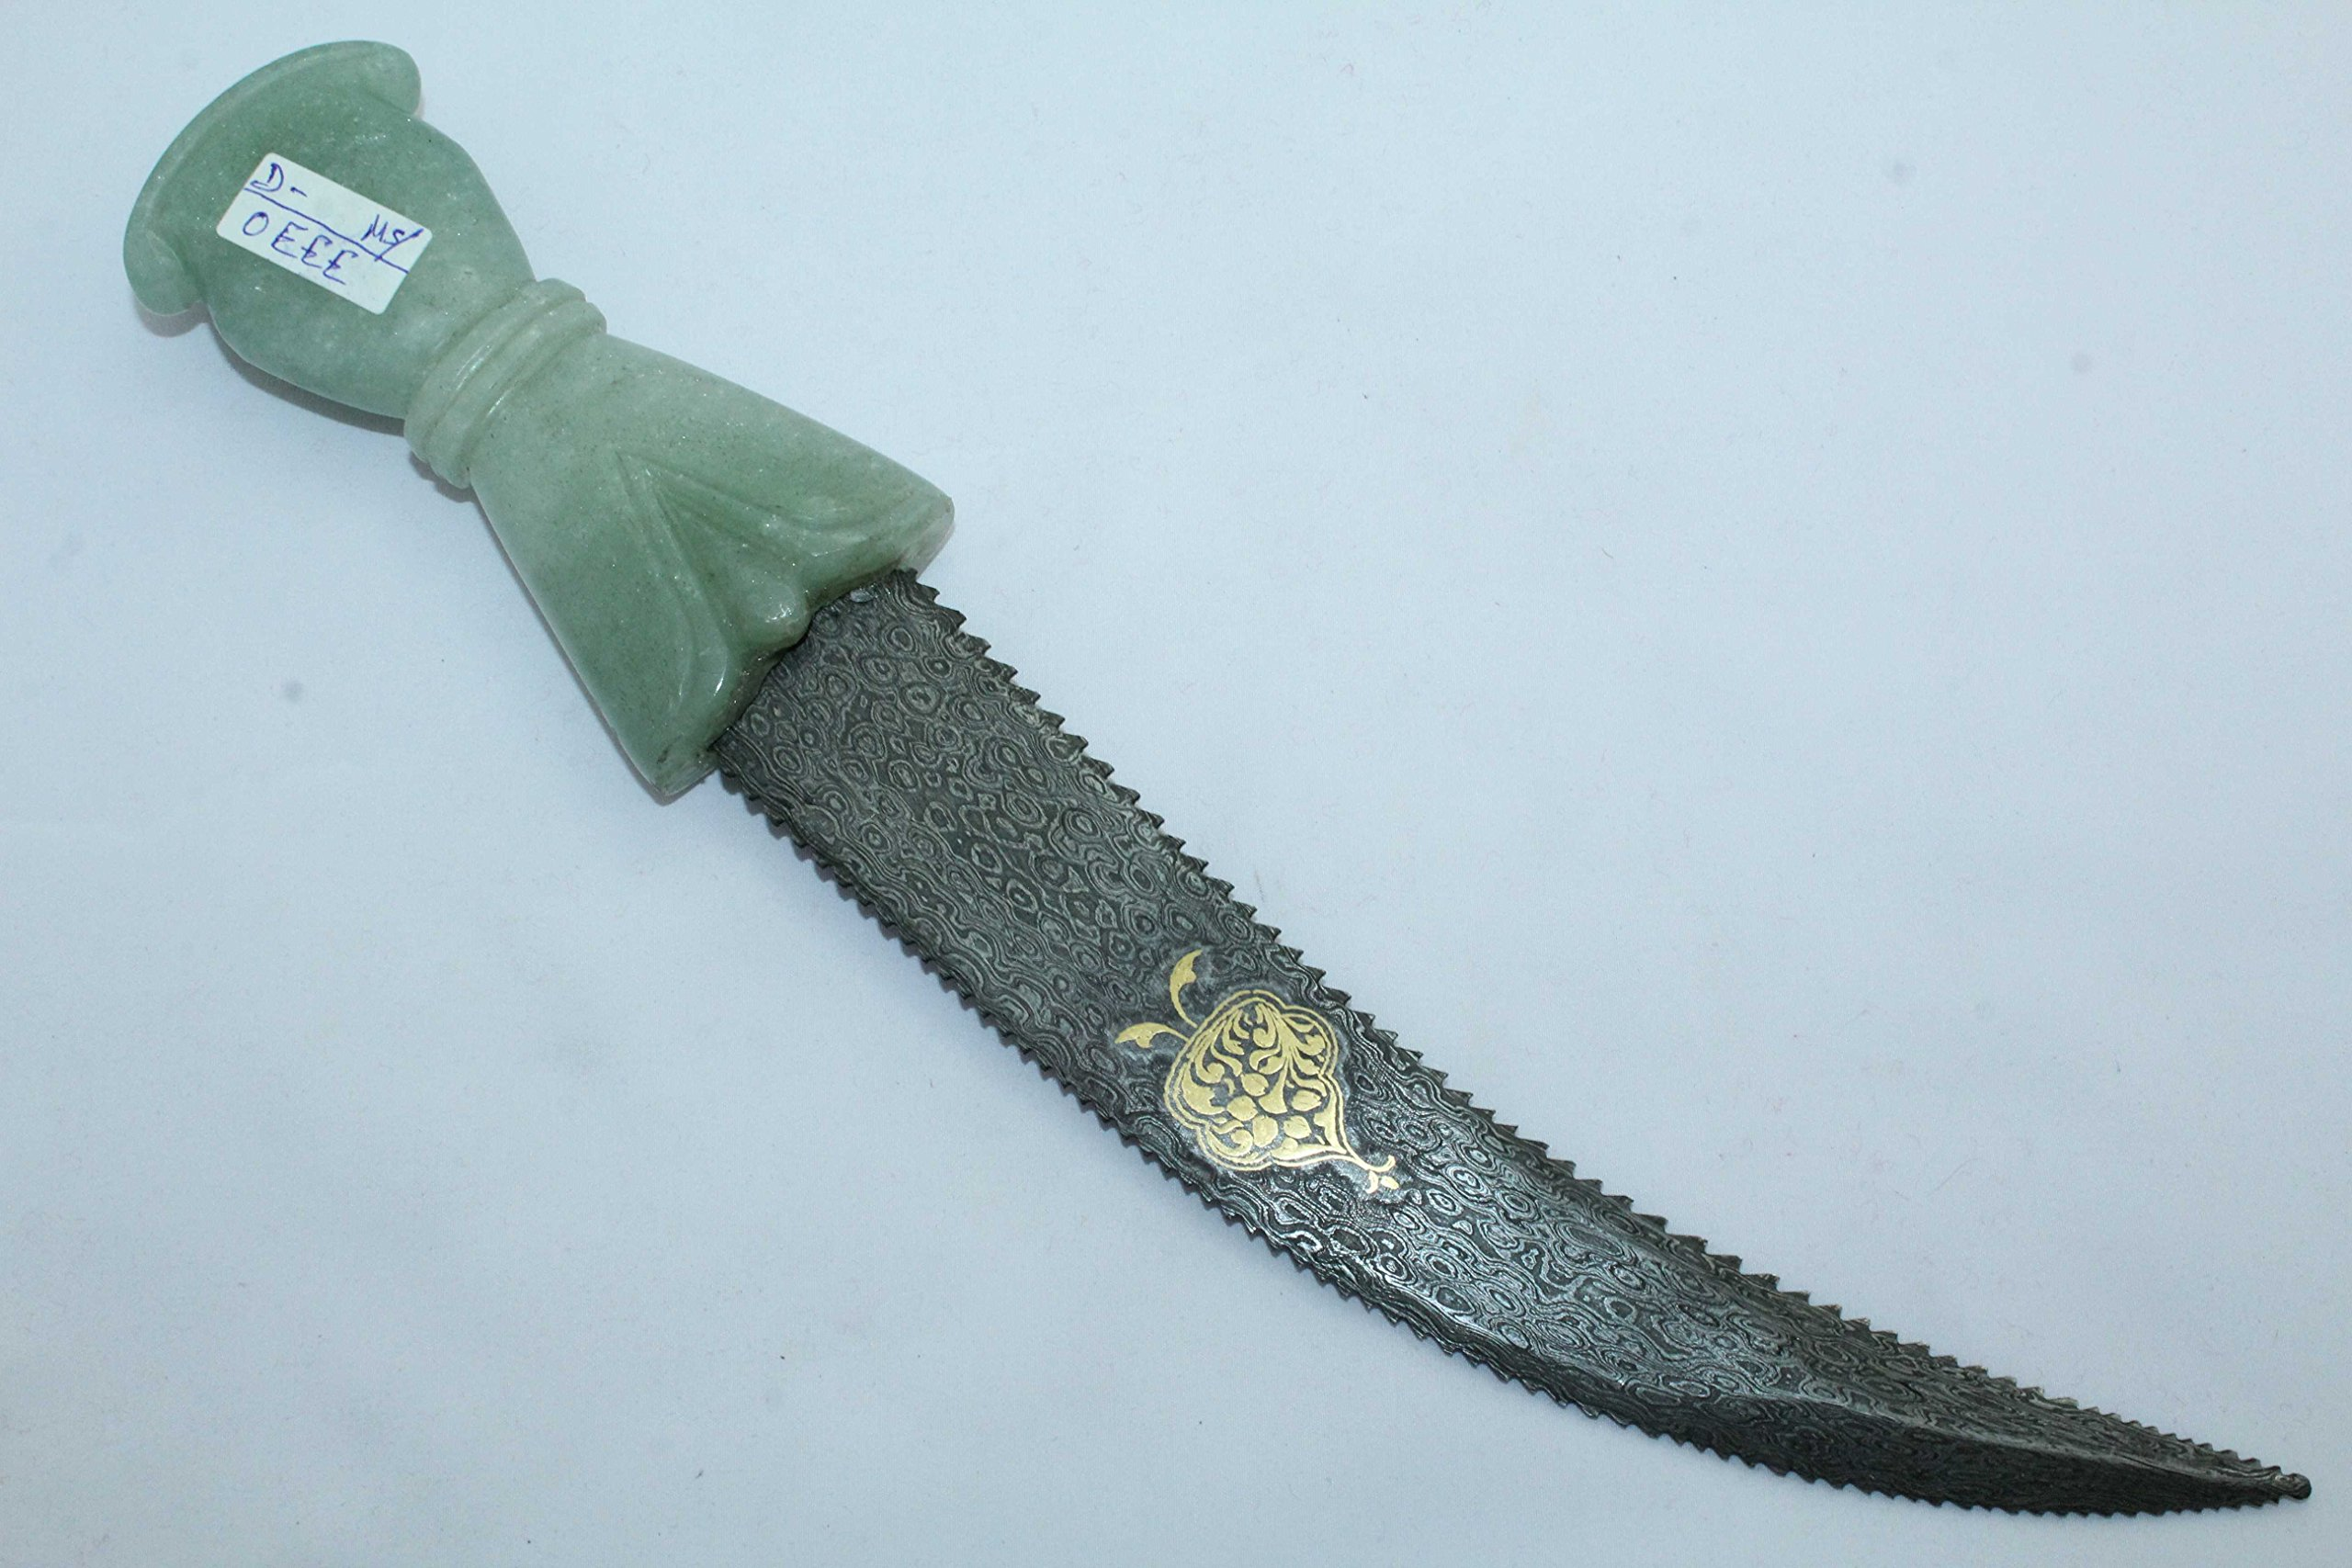 Rajasthan Gems Handmade Green Jade stone Handle Dagger Knife Damascus steel gold work on blade